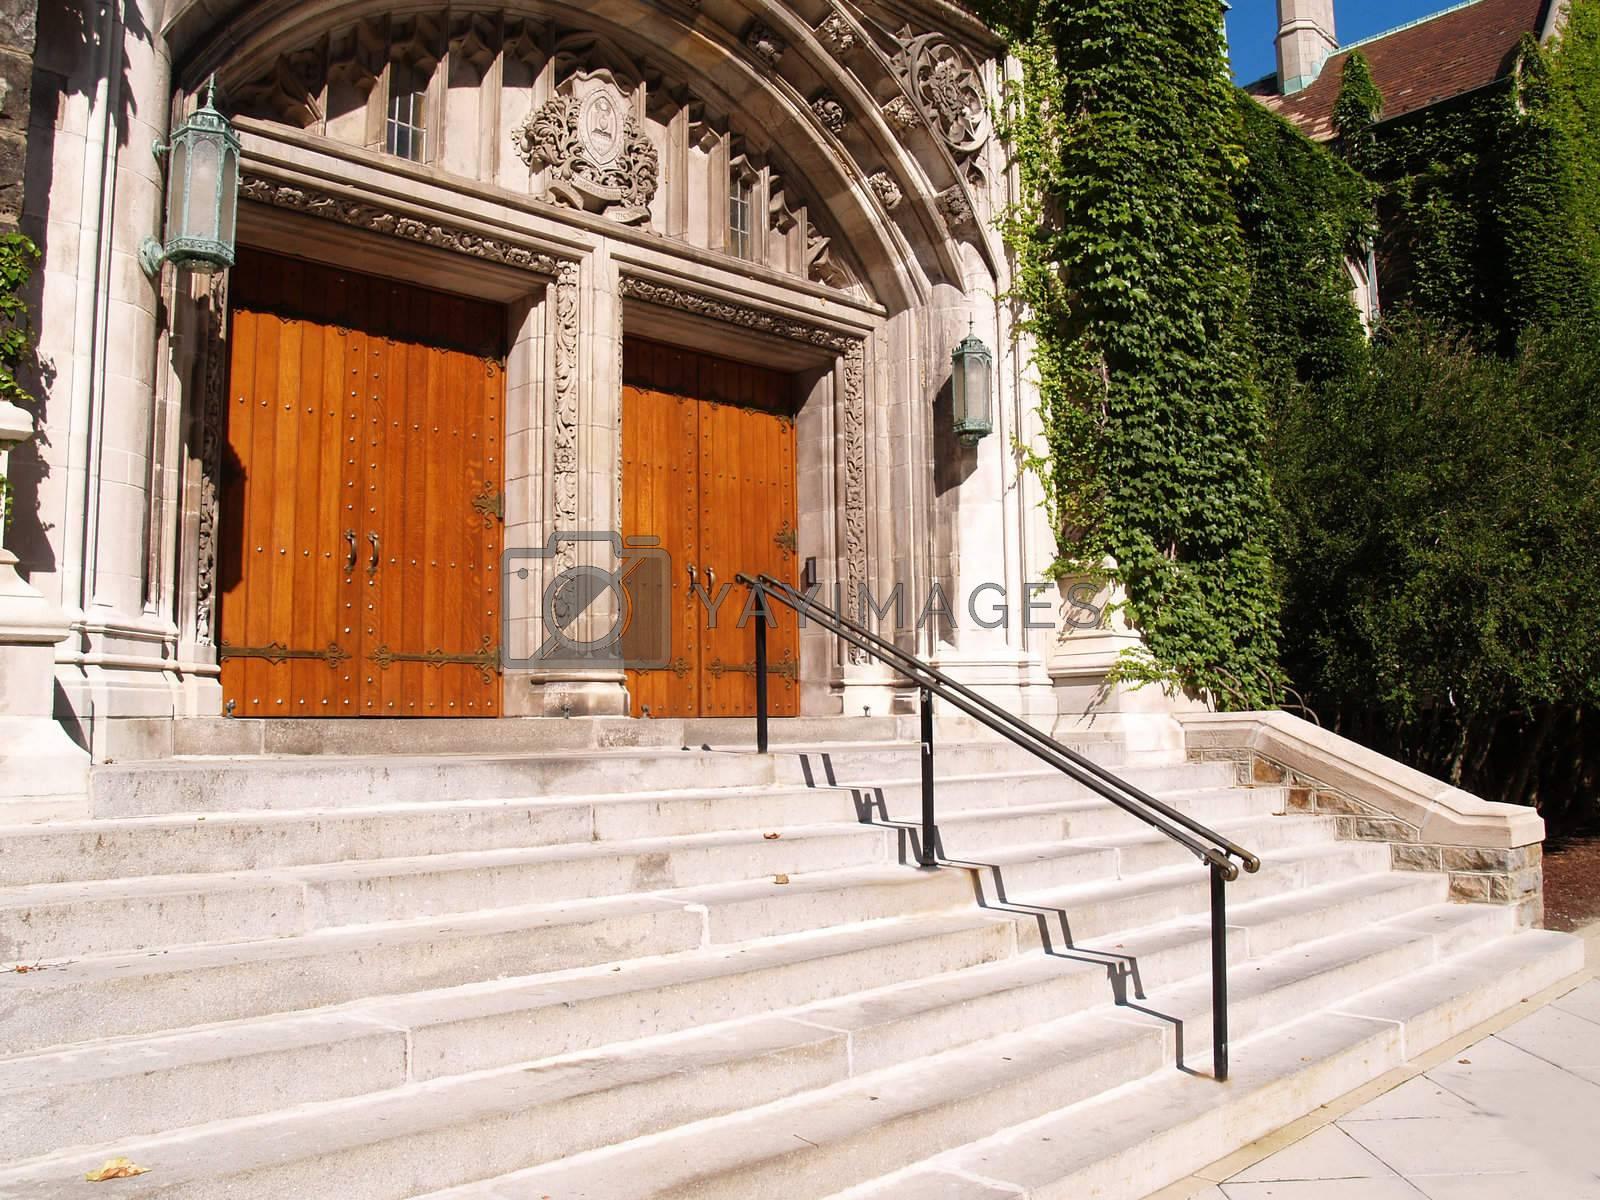 Royalty free image of Alumni Memorial Building, Lehigh University by cfarmer